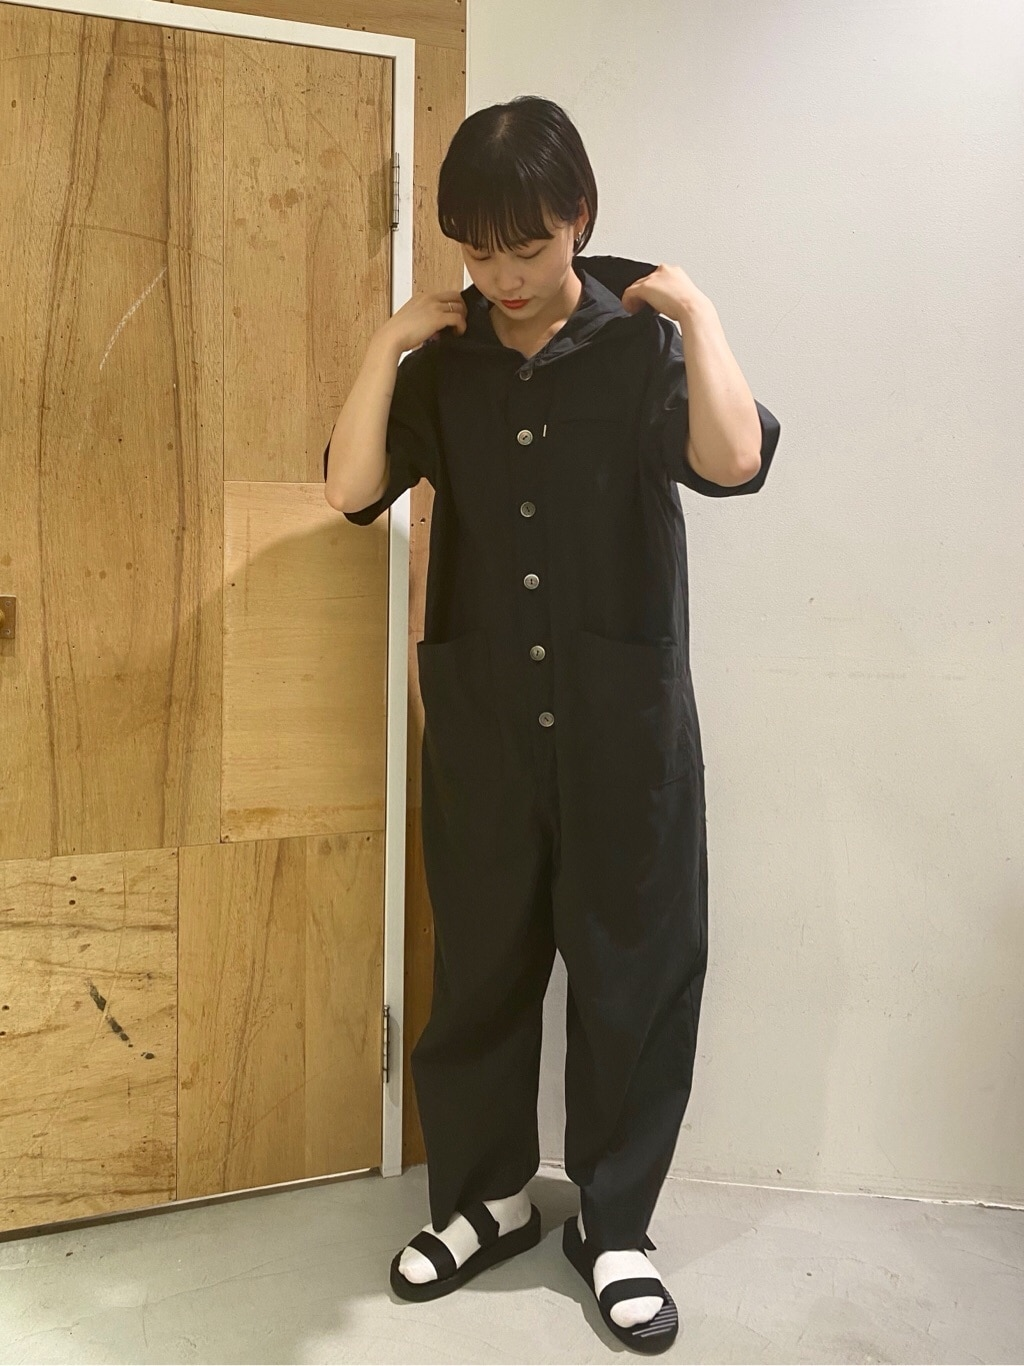 l'atelier du savon 新宿ミロード 身長:159cm 2020.06.16